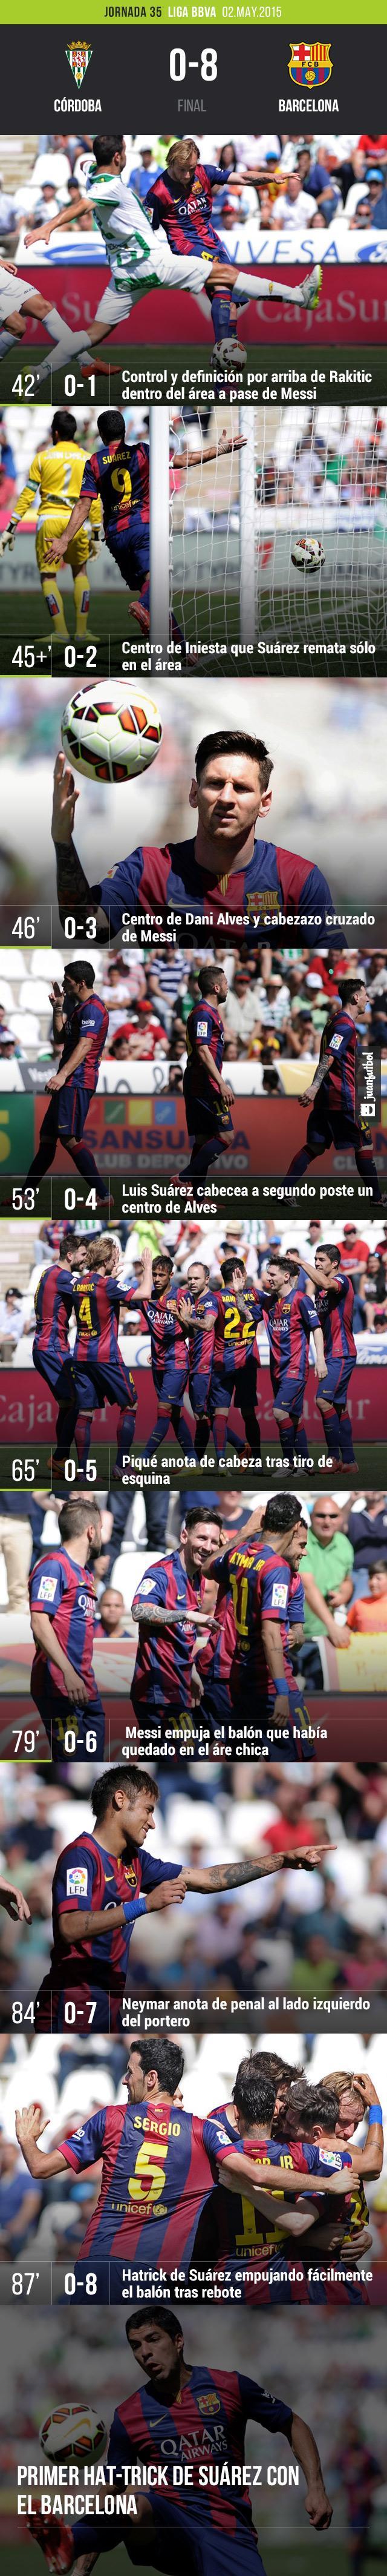 Barcelona derrota al Córdoba 8-0 con goles de Suárez, Messi, Neymar, Piqué y Rakitic